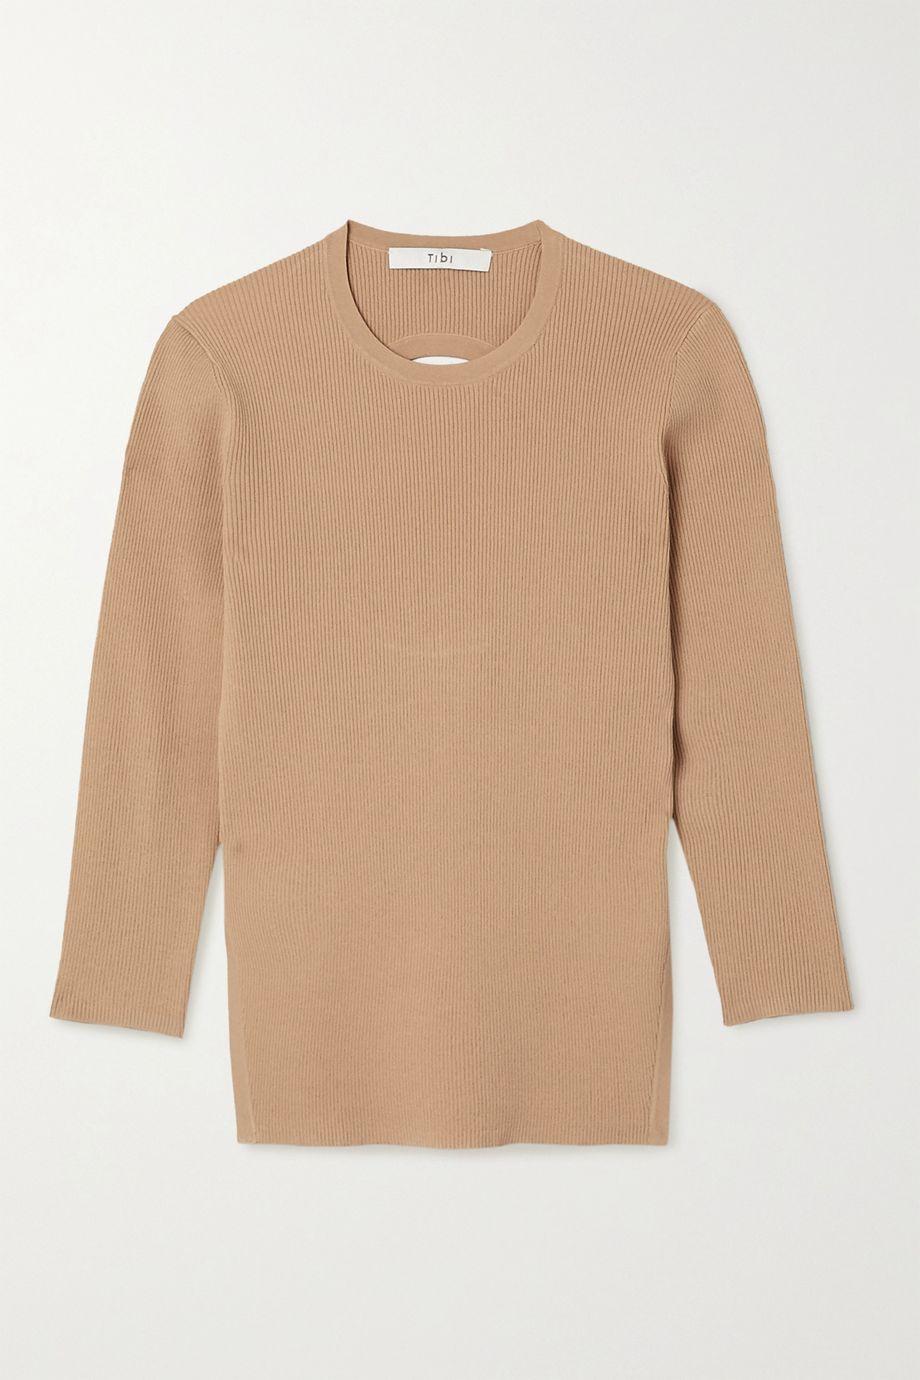 Tibi Giselle cutout ribbed-knit sweater